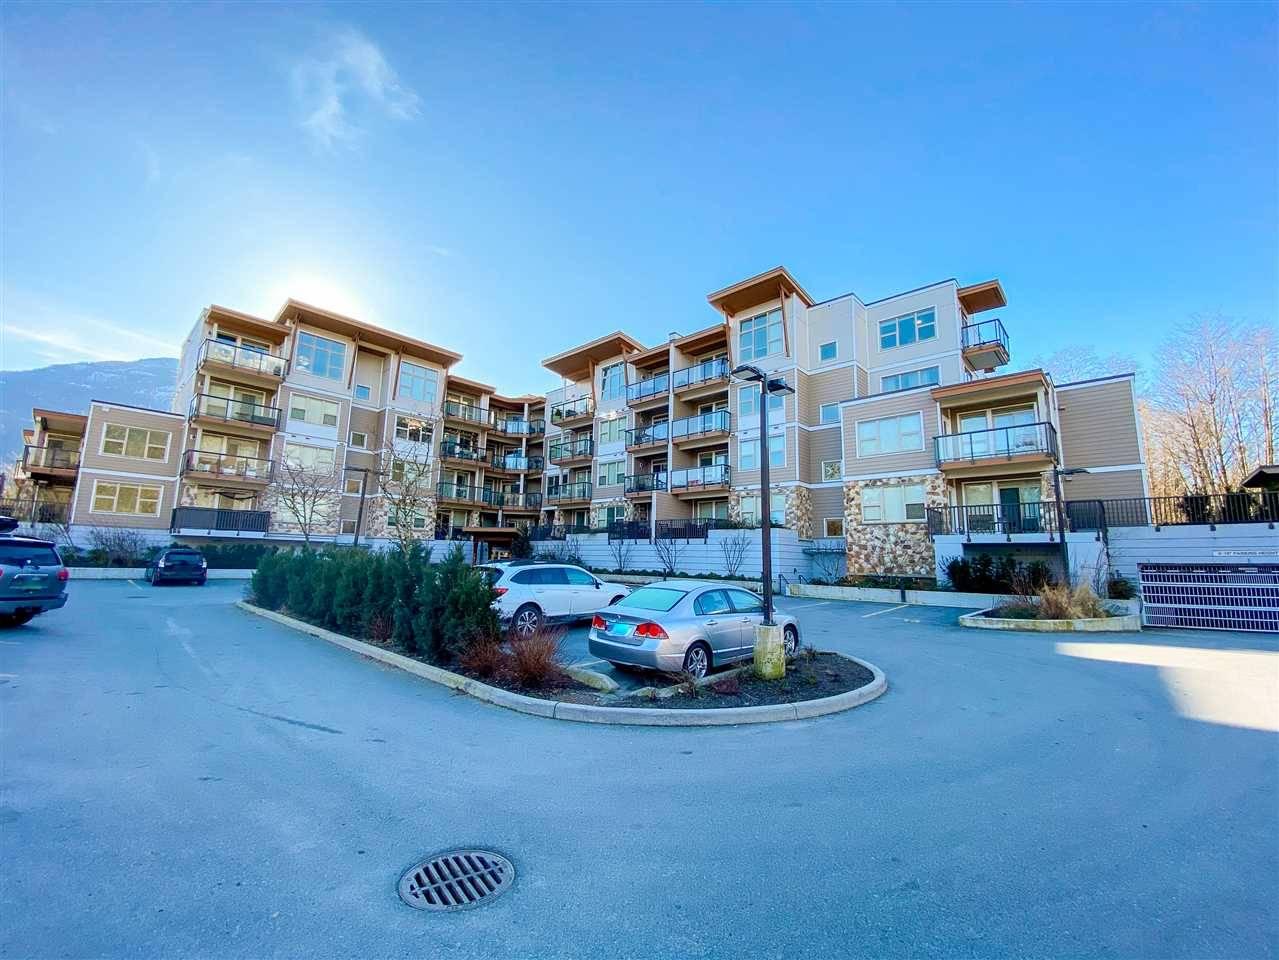 Buliding: 1150 Bailey Street, Squamish, BC